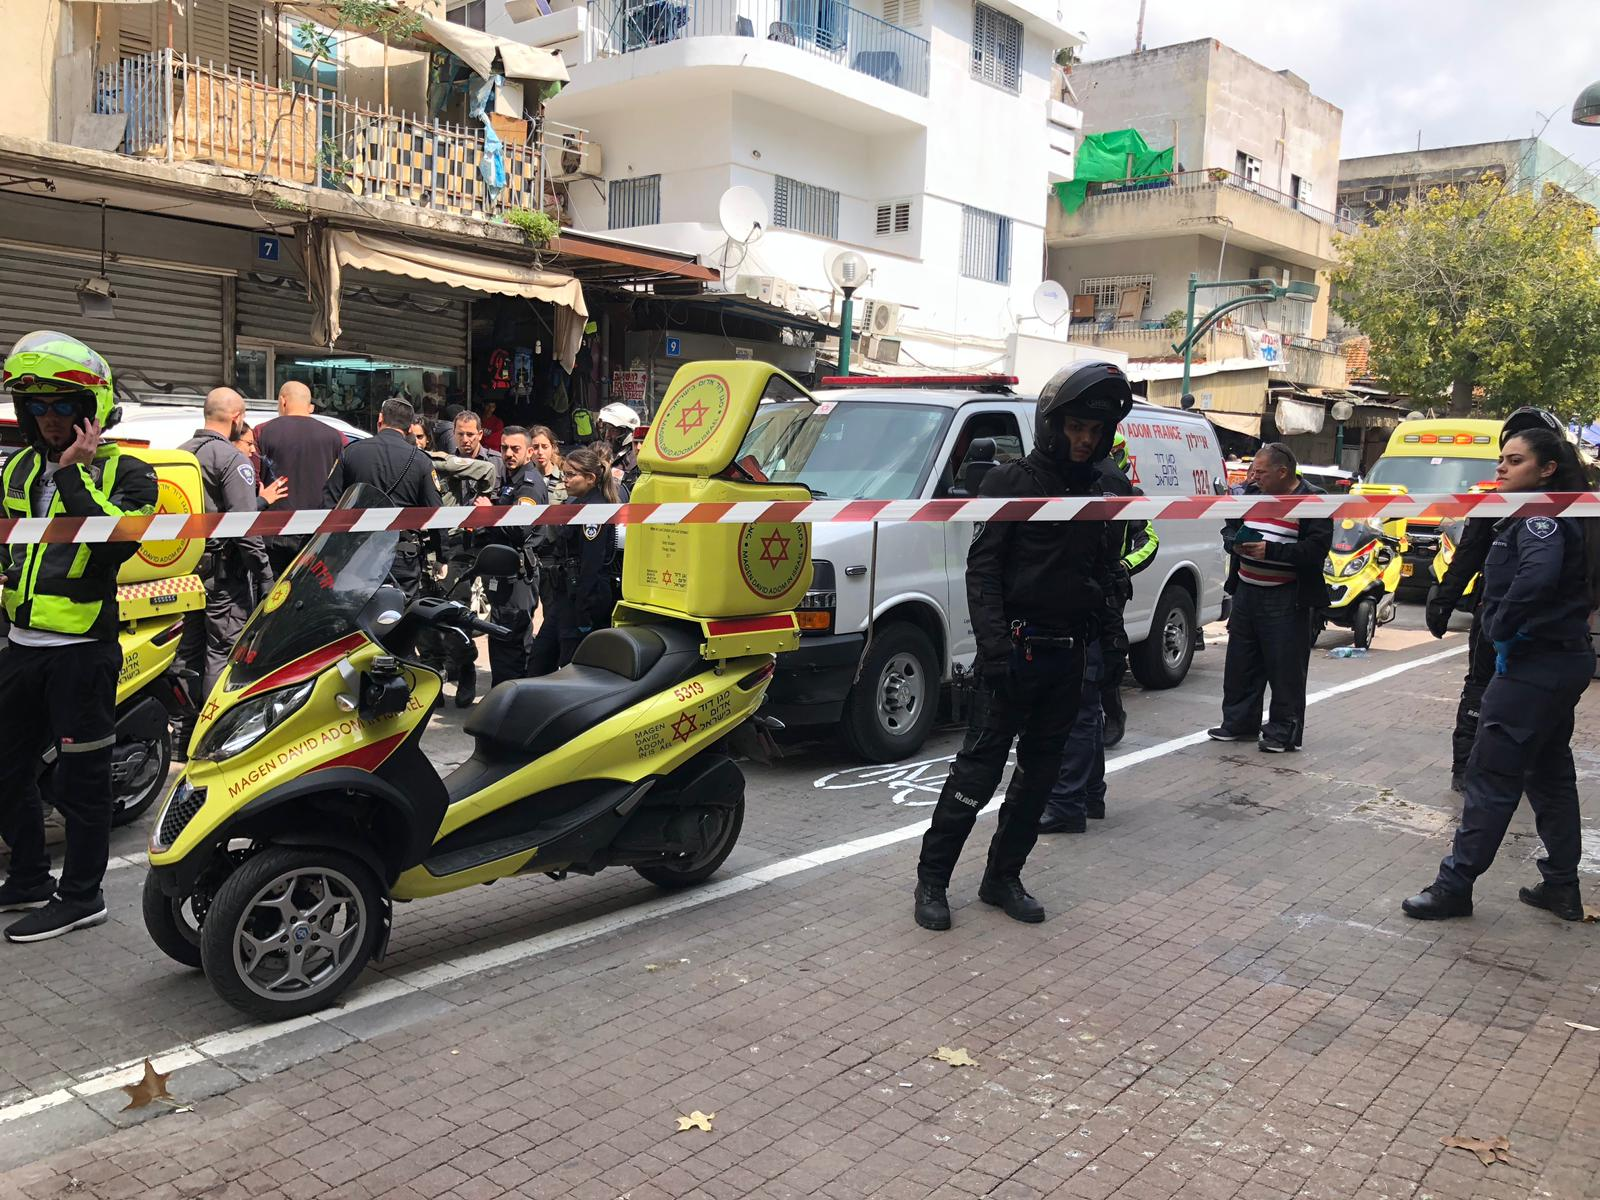 Photo of שני עובדים זרים נפצעו מדקירות במהלך קטטה שפרצה בנווה שאנן בתל אביב. נעצר חשוד במעשה